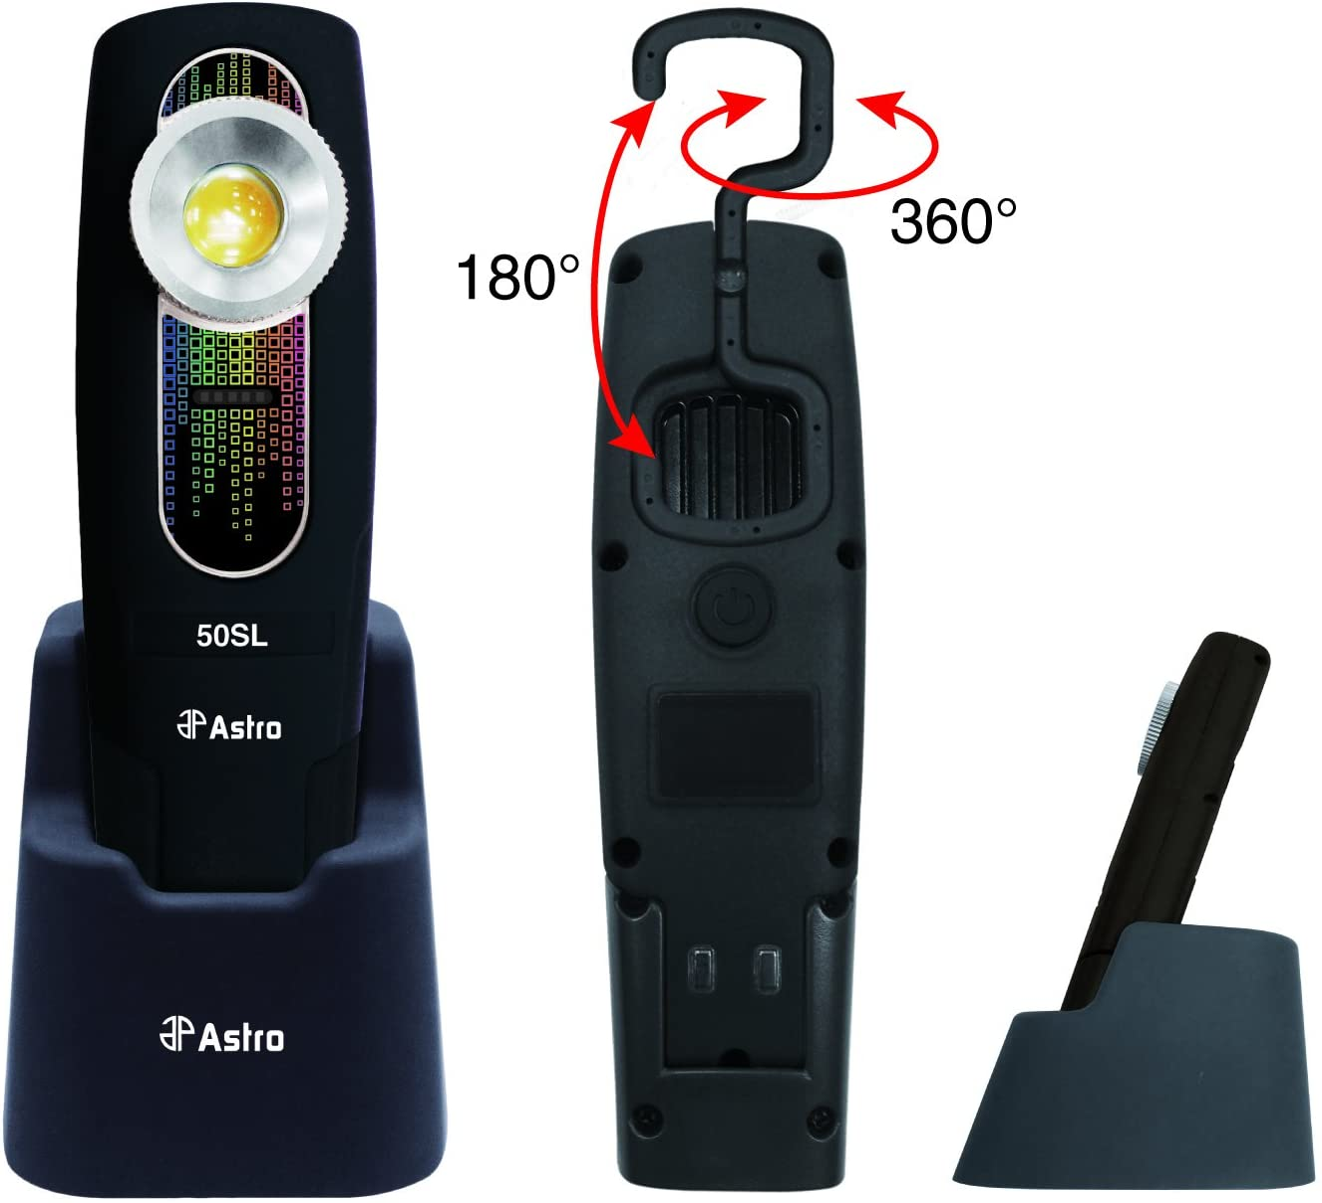 SunLight 400 Lumen Rechargeable Handheld Color Match Light AST-50SL Brand New!